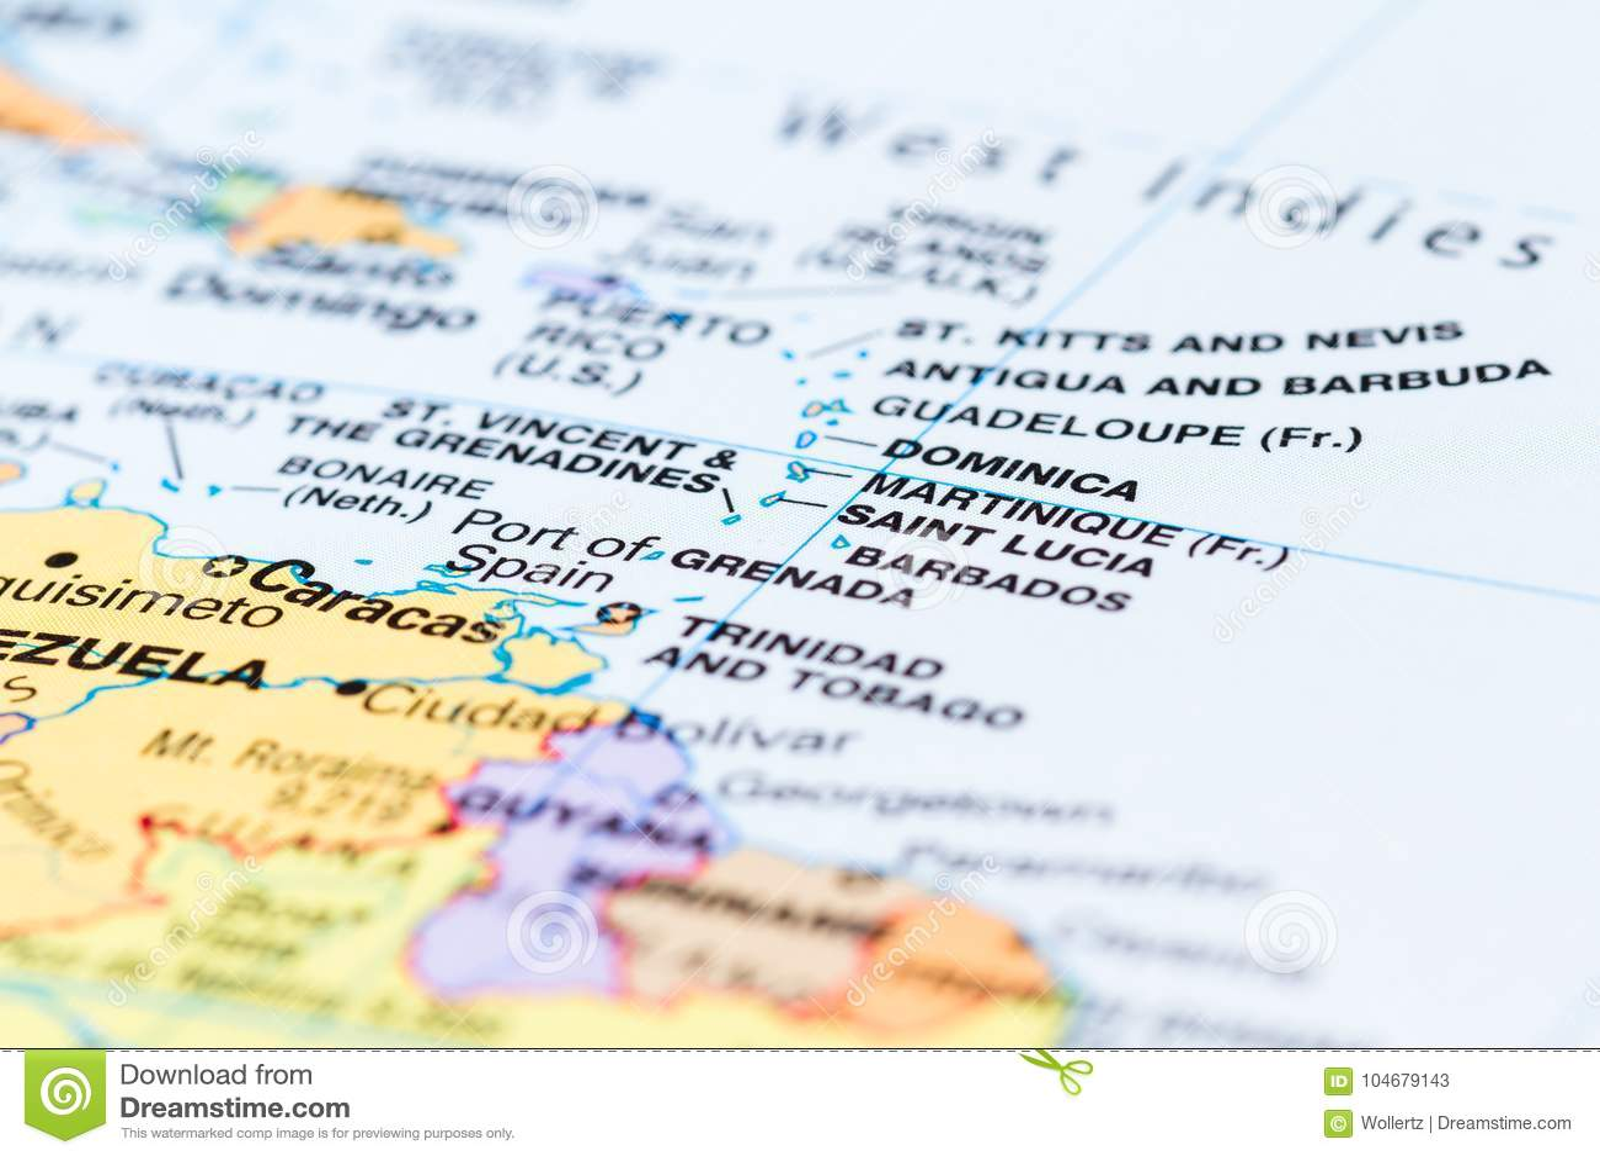 Islands in the Caribean